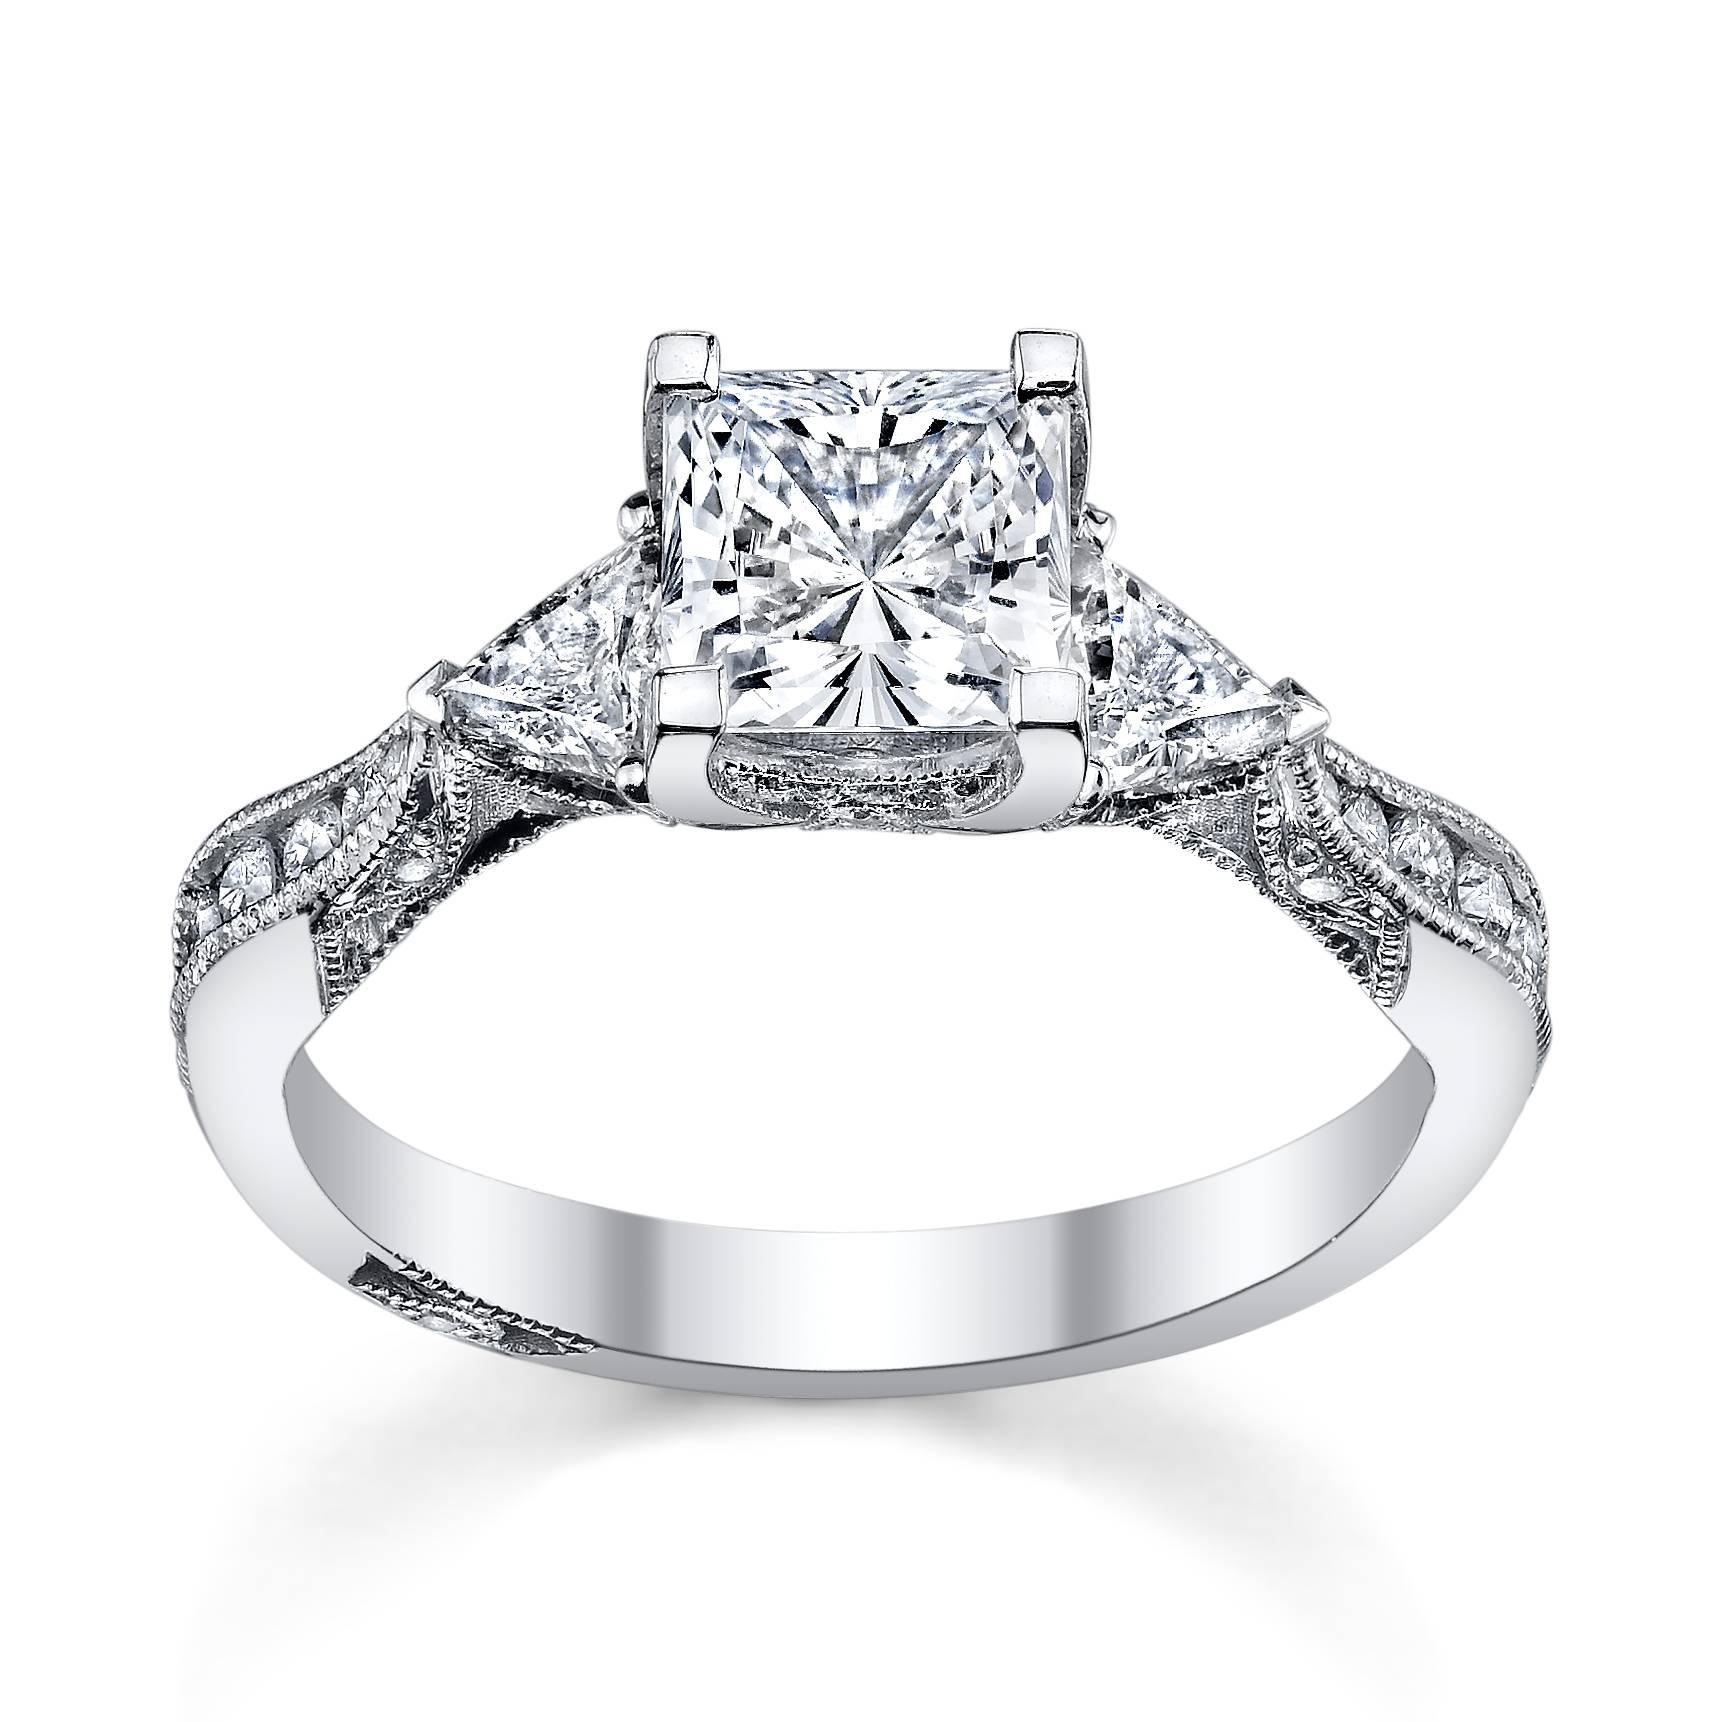 Wedding Rings : Princess Cut Diamond Engagement Ring And Wedding For Princess Cut Wedding Rings For Women (View 8 of 15)